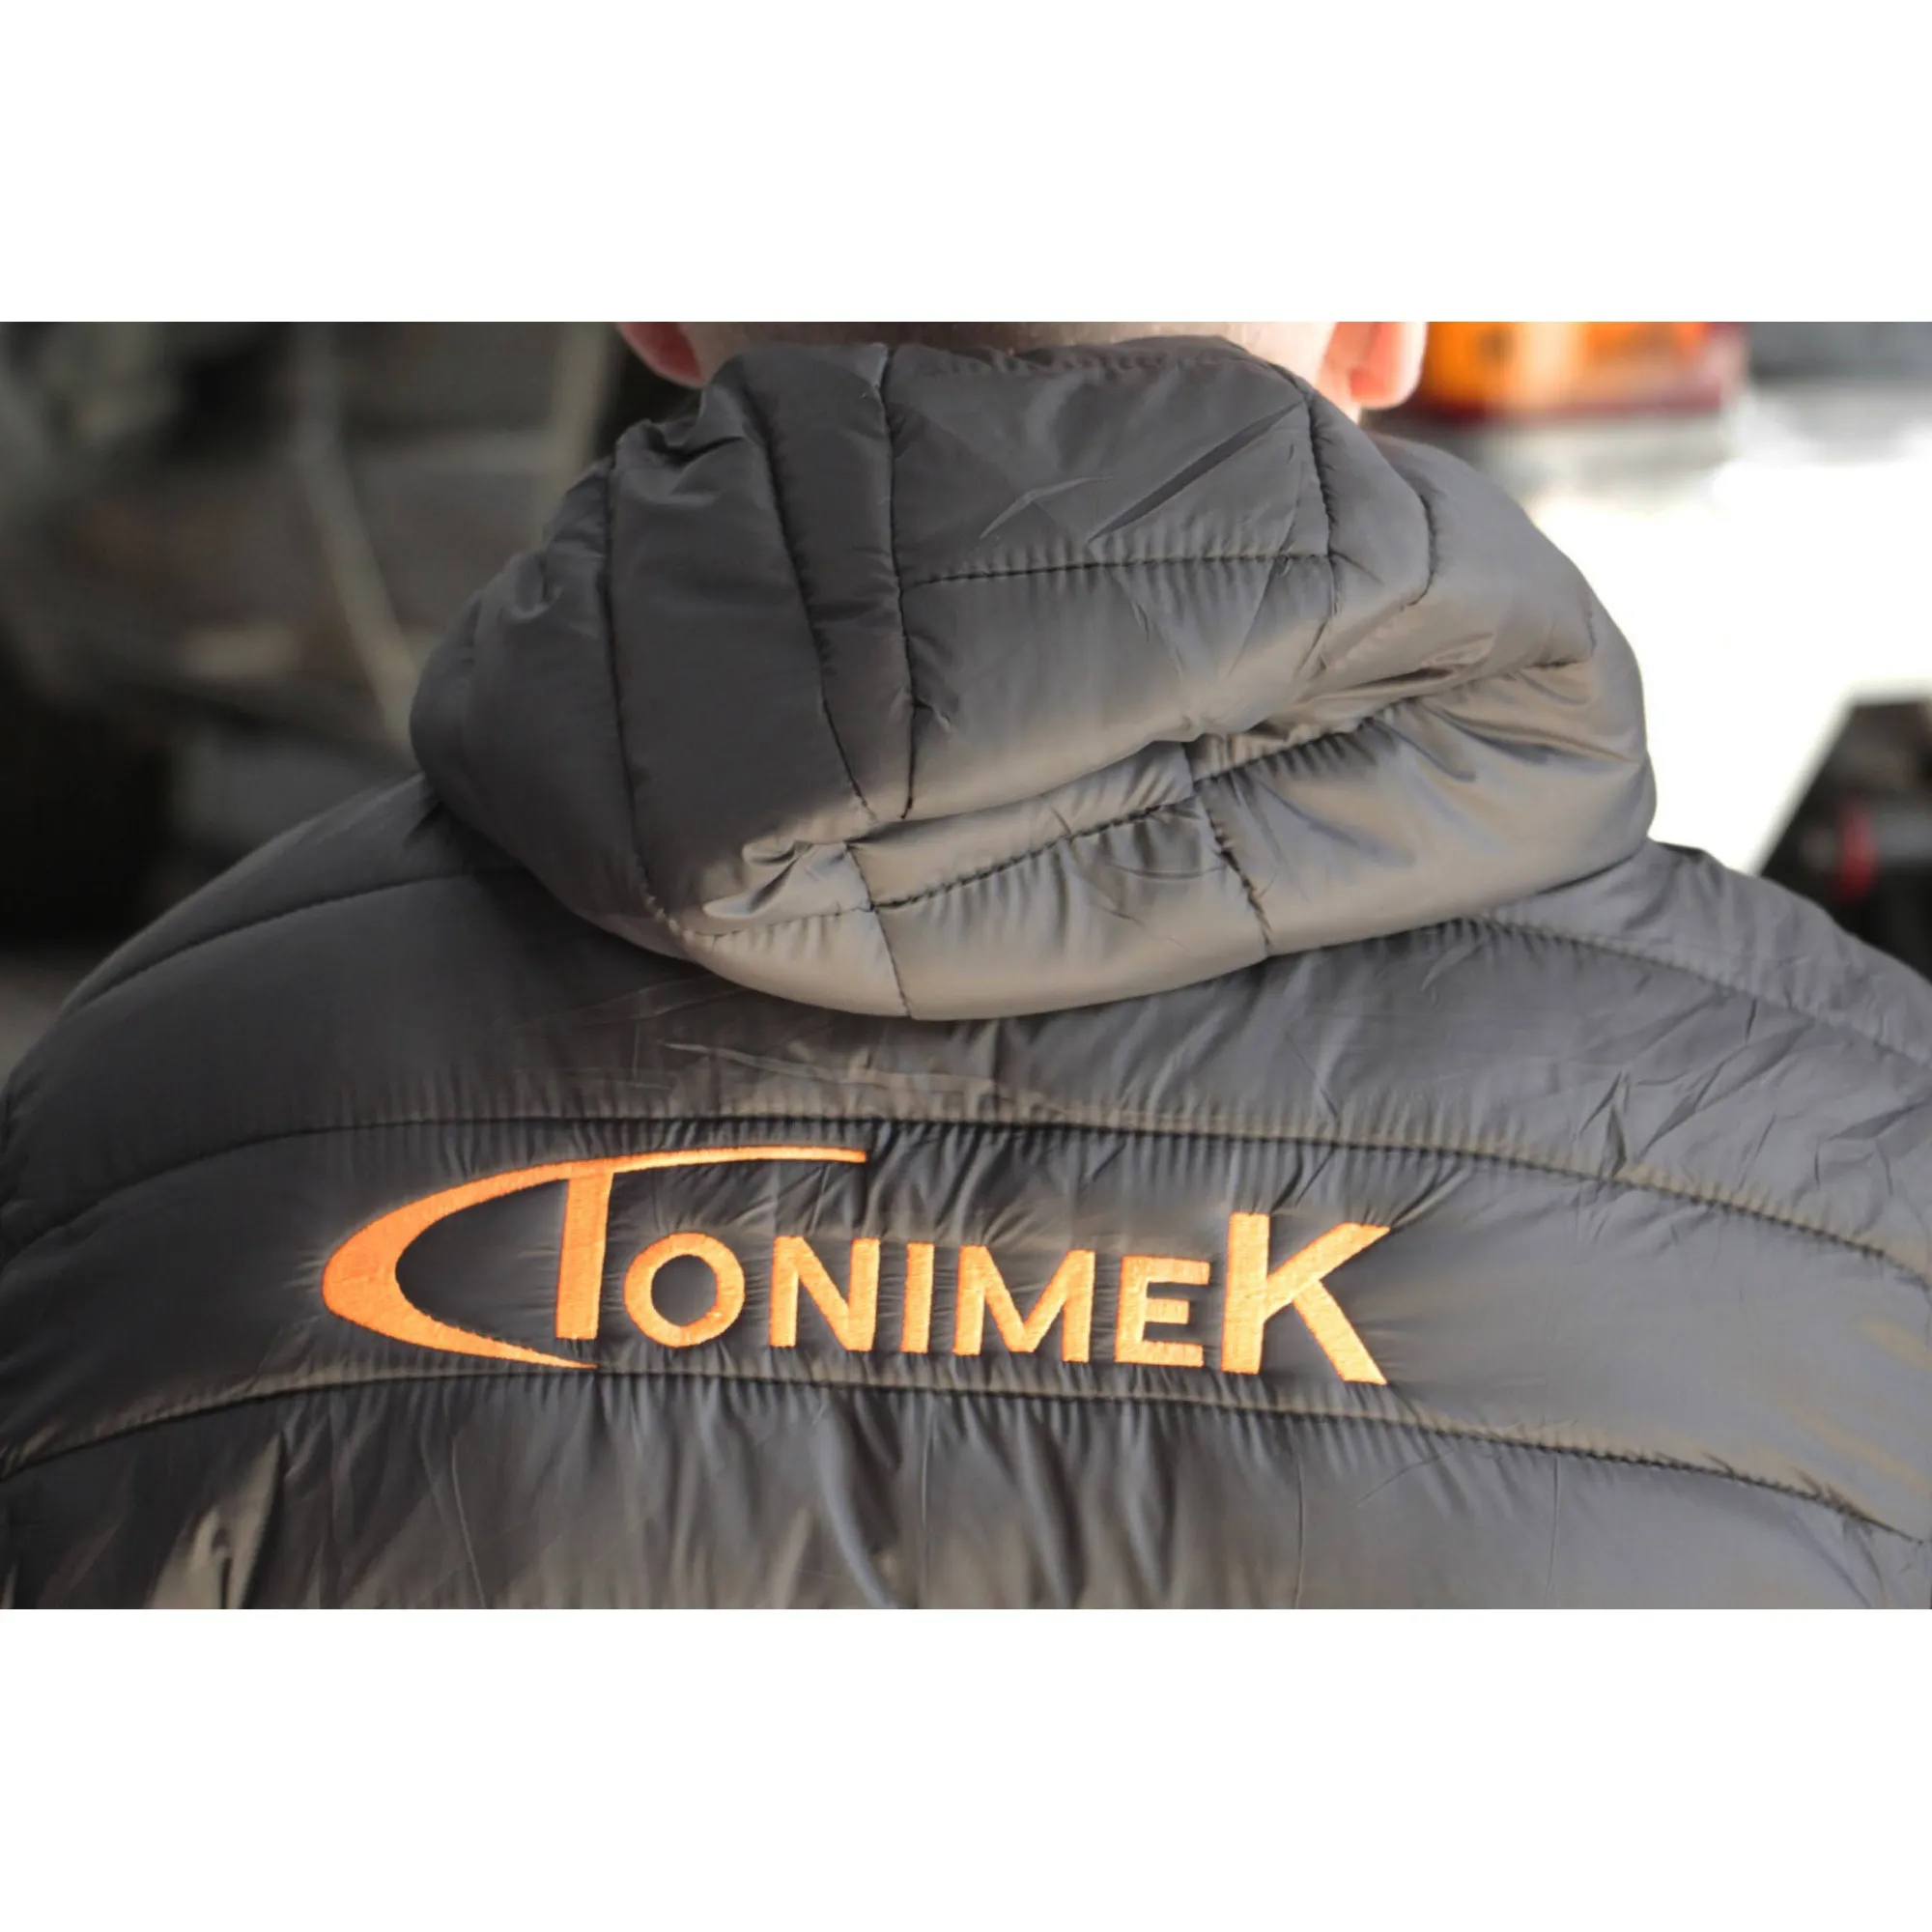 JAQUETA - TONIMEK®